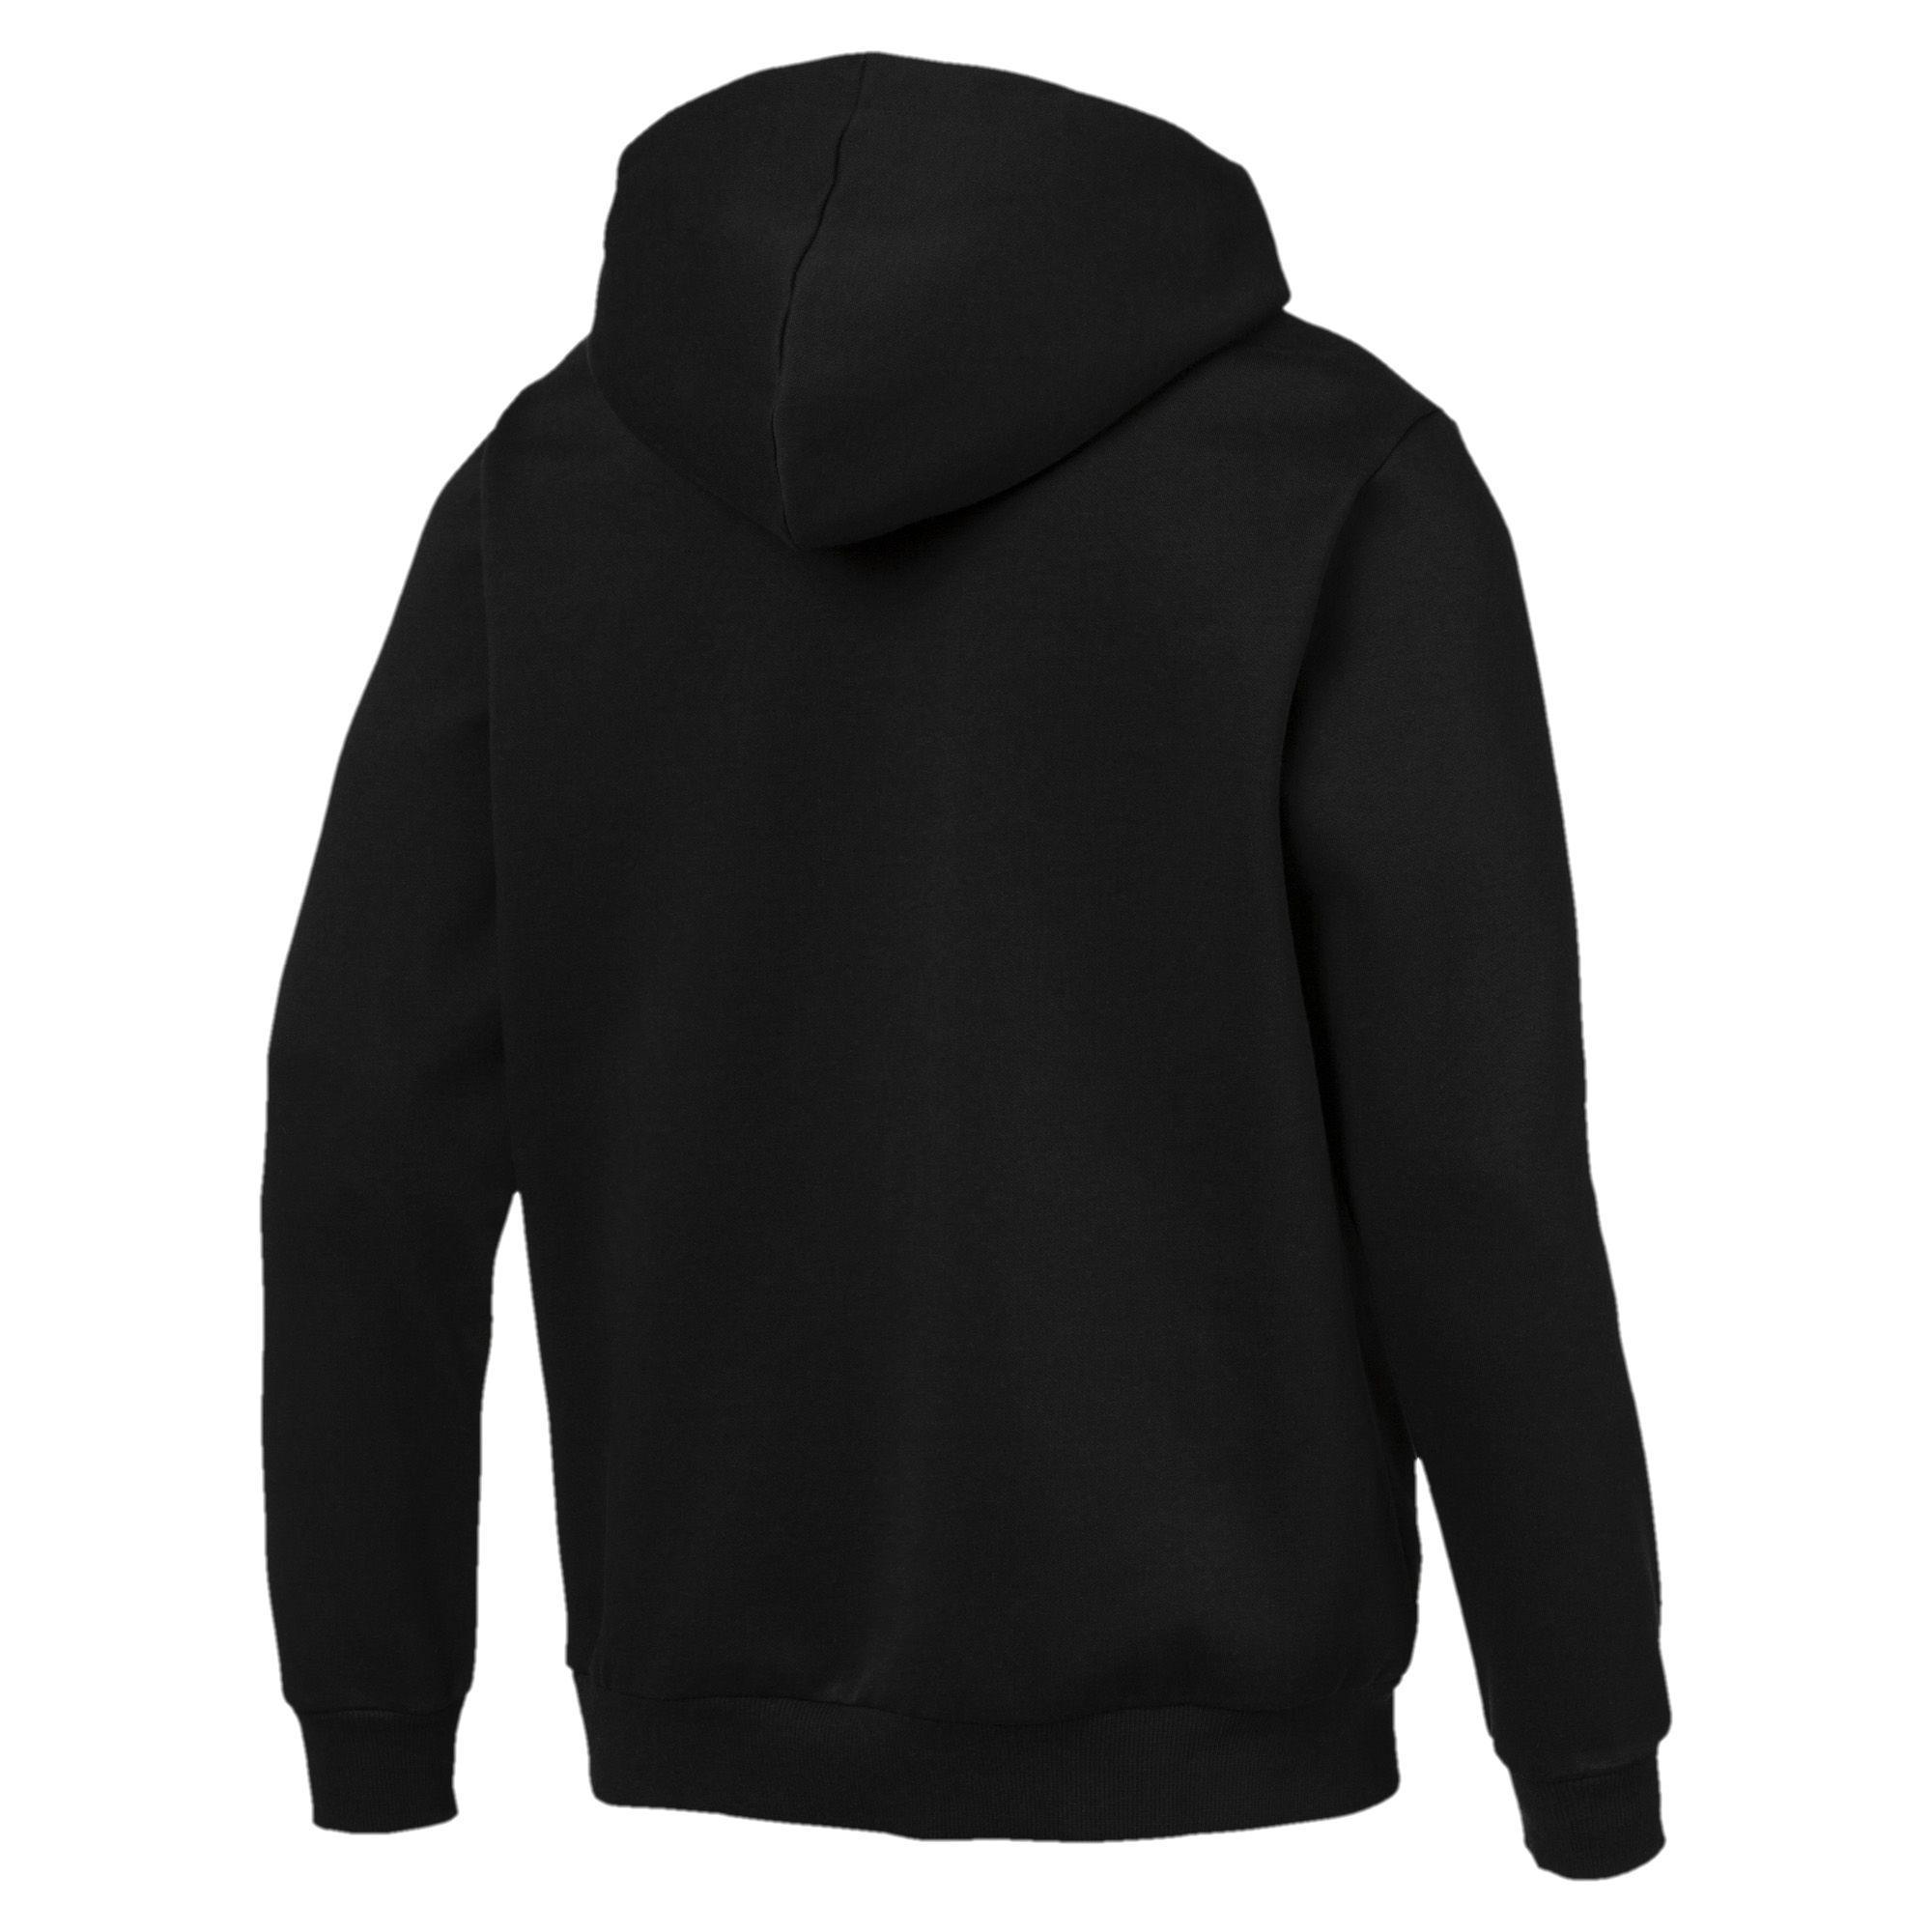 7aa3d6f7c836 PUMA - Black Essentials Hooded Jacket for Men - Lyst. View fullscreen